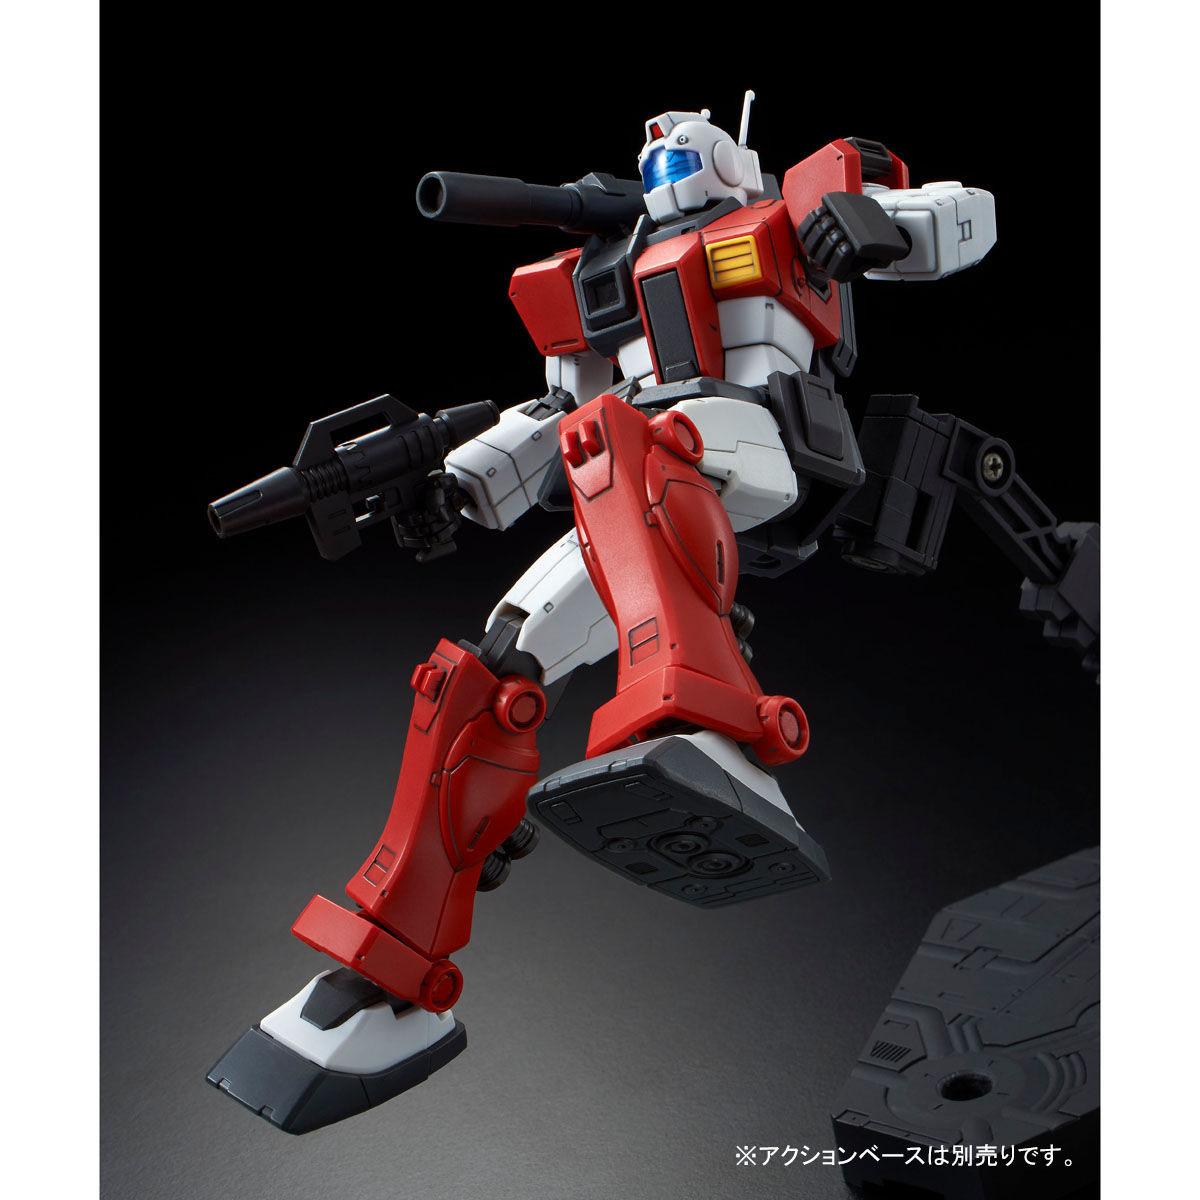 HG 1/144『ジム・キャノン(空間突撃仕様)』機動戦士ガンダム THE ORIGIN MSD プラモデル-005